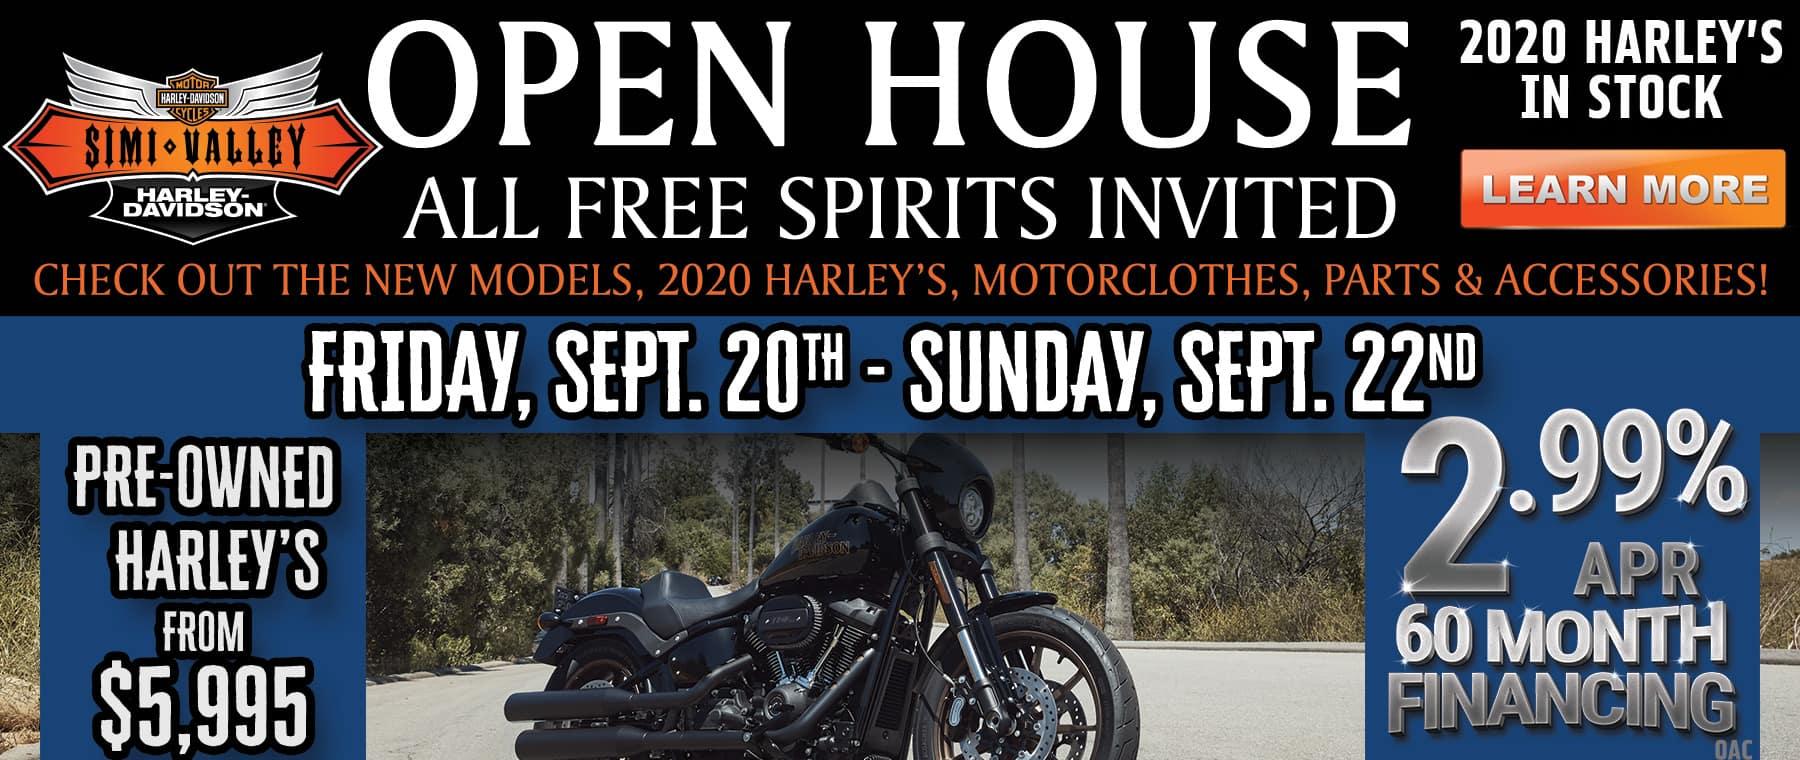 Harley-Davidson Dealer in Moorpark, CA